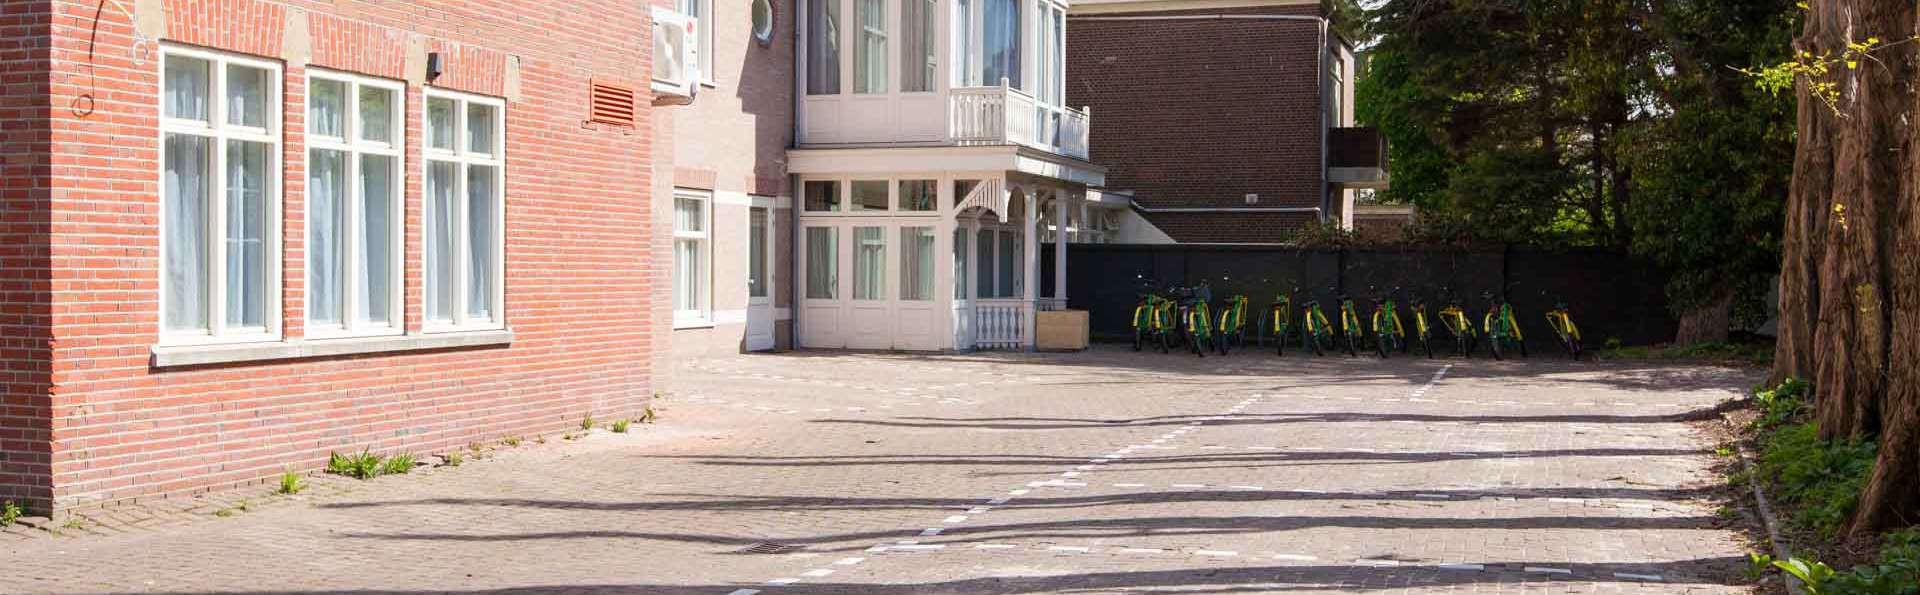 Best Western Den Haag - Edit_FRONT.jpg